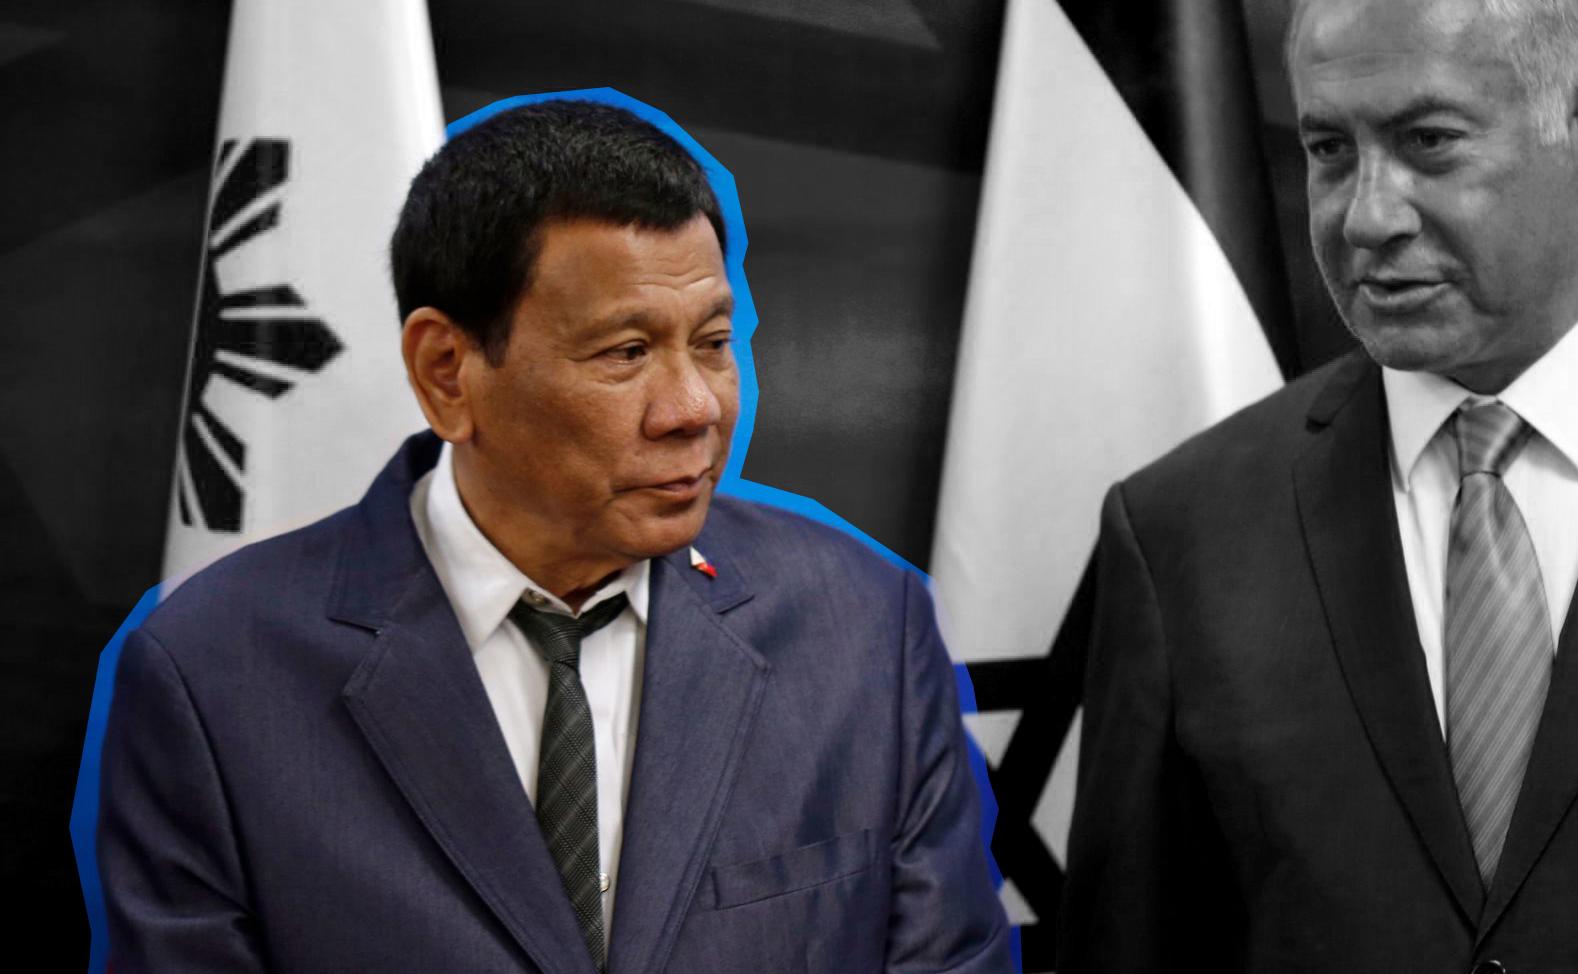 President of the Philippines Rodrigo Duterte (left) with Israeli Prime Minister Benjamin Netanyahu in Jerusalem, Sept. 3, 2018. (JTA/Ronen Zvulun/AFP via Getty Images)